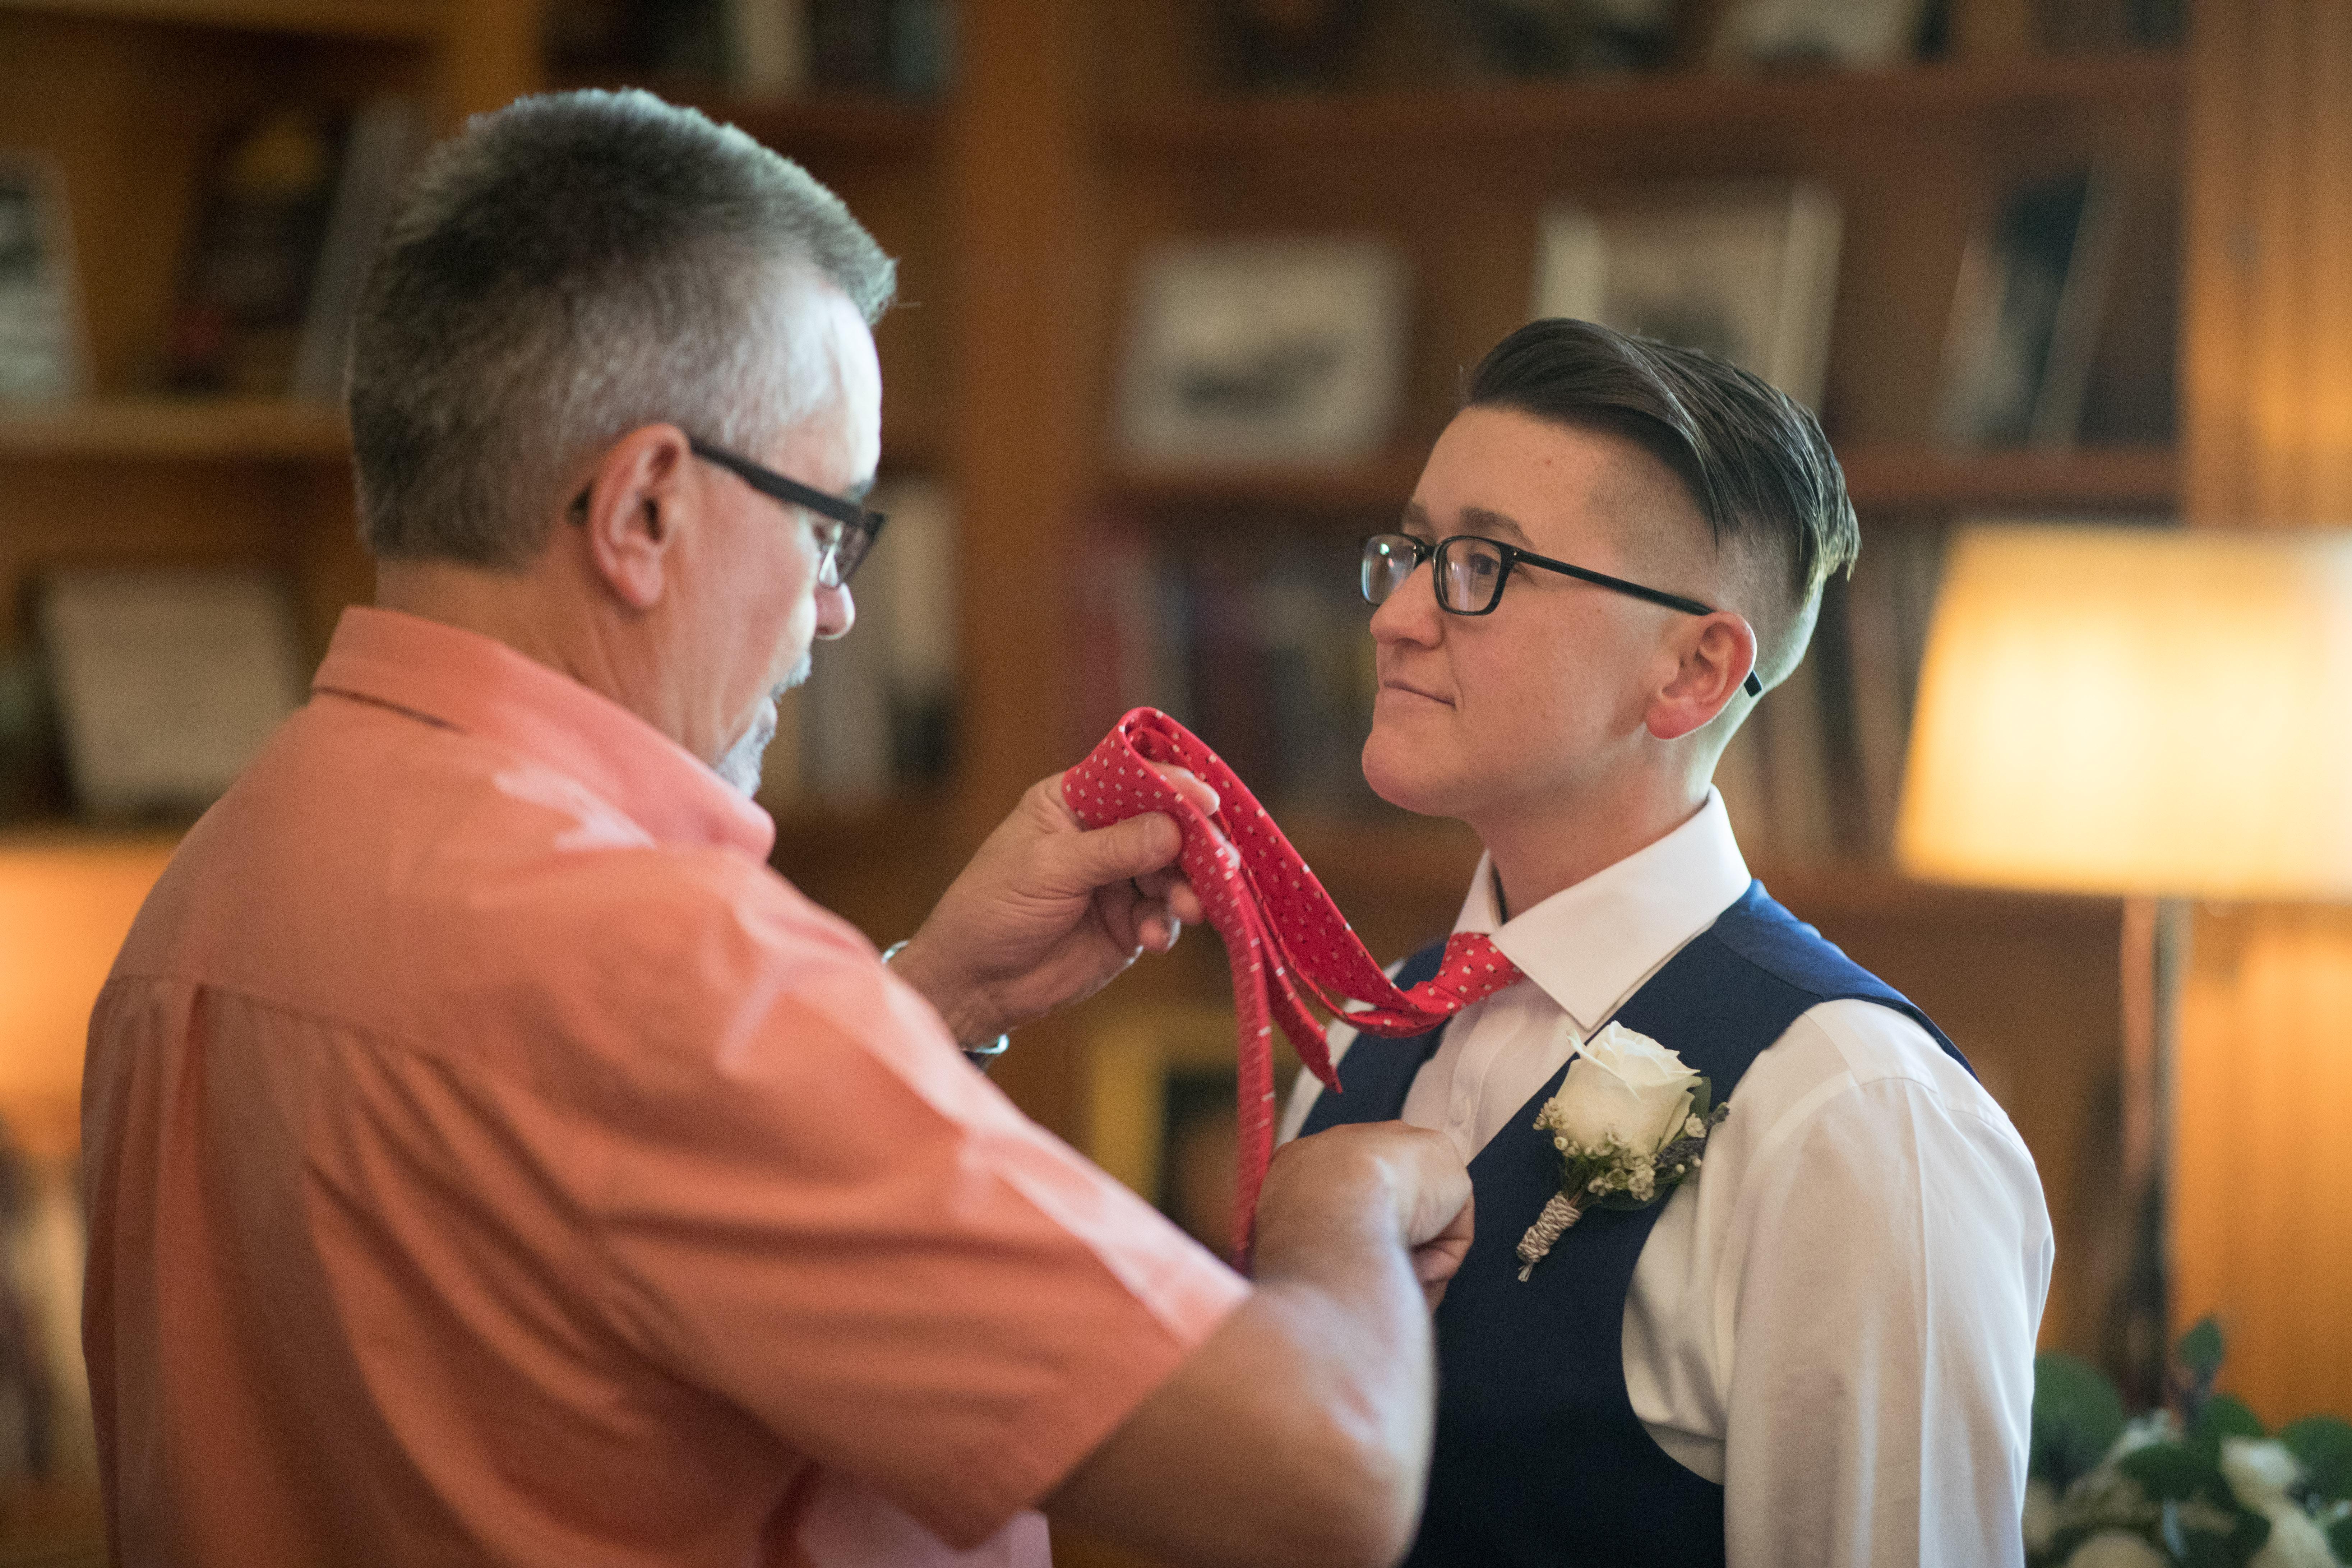 Bak & Pepin Wedding - Geting Ready-33